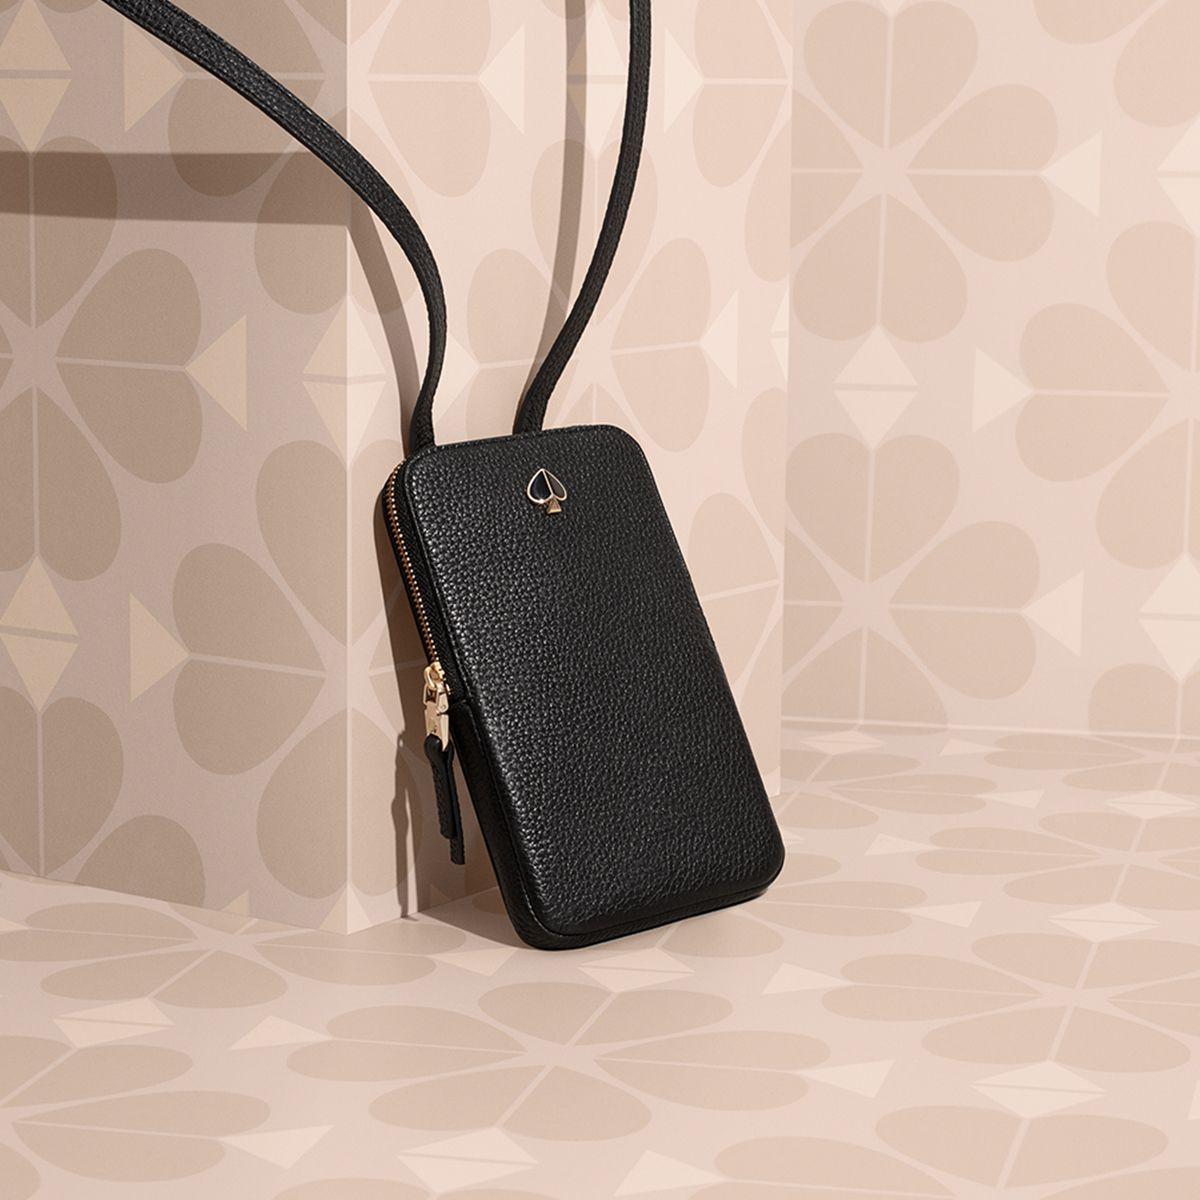 e1379caf92 Kate Spade Purses   Handbags - Macy s